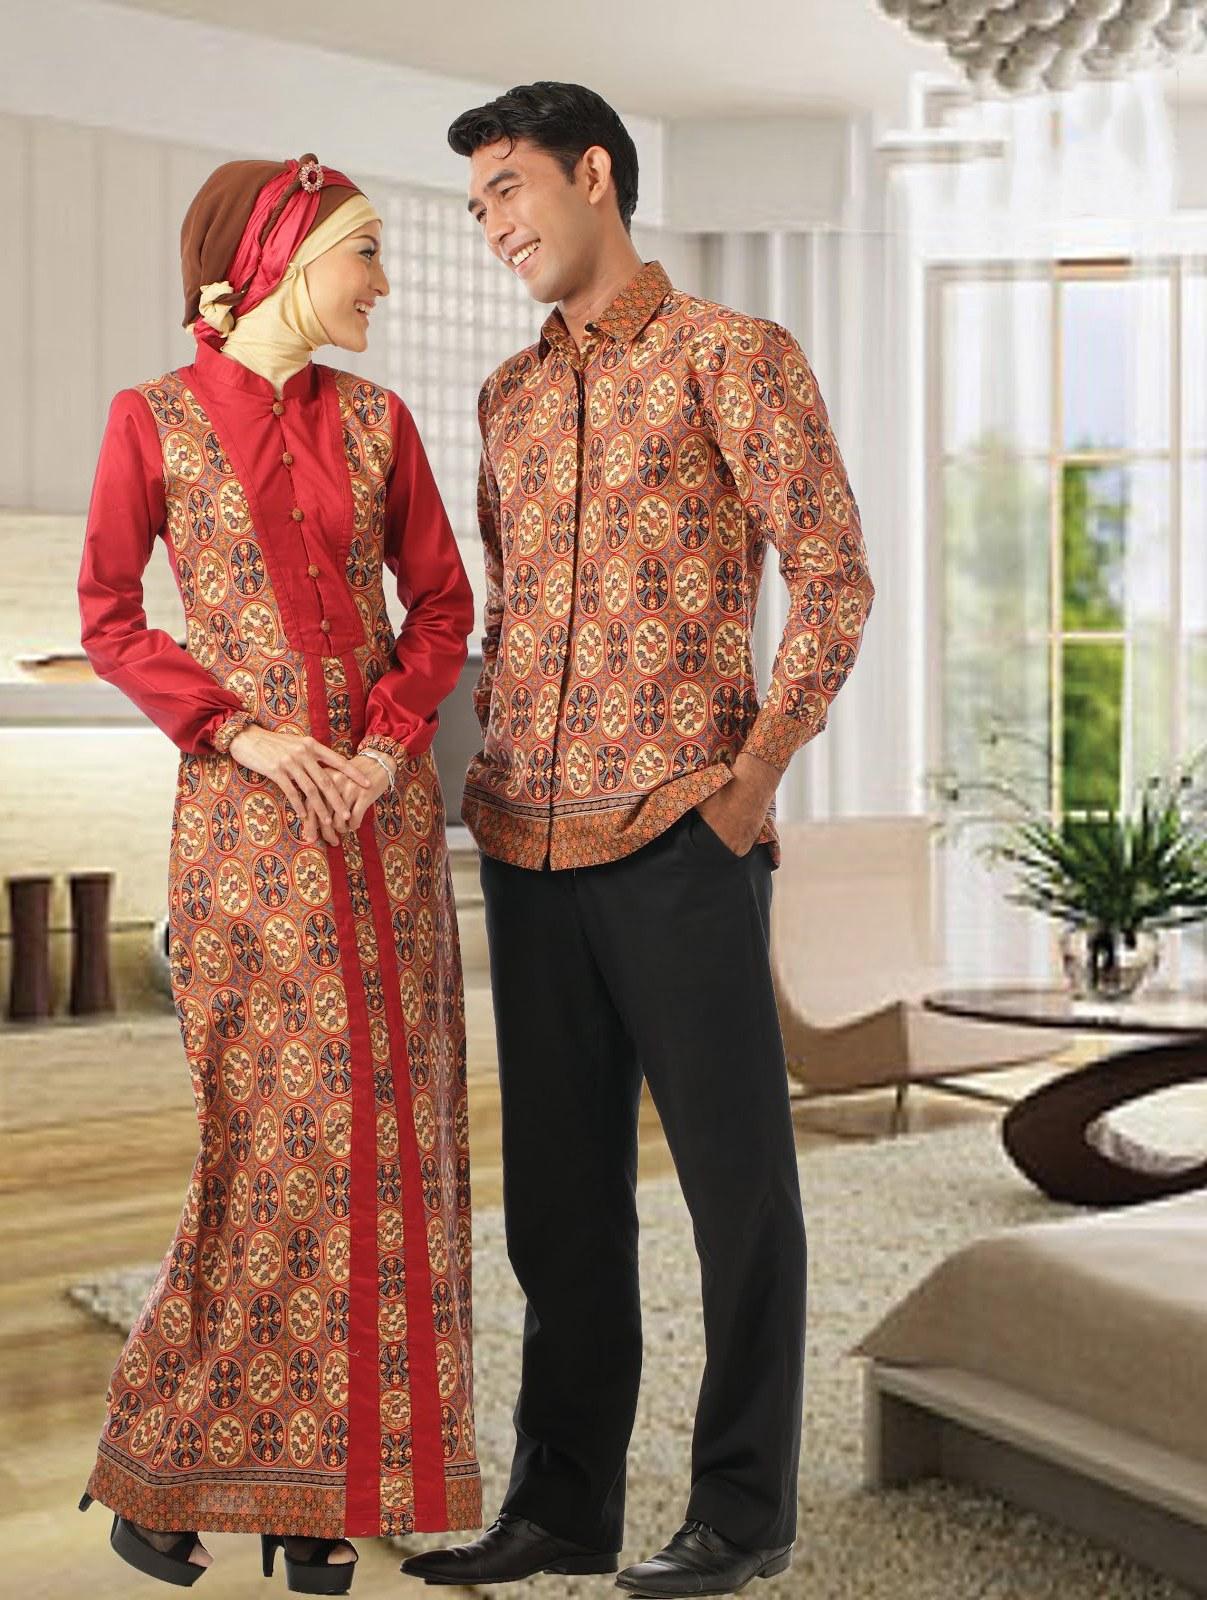 Bentuk Model Baju Lebaran Wanita Terbaru Nkde Trend Model Baju Batik Lebaran Terbaru 2013